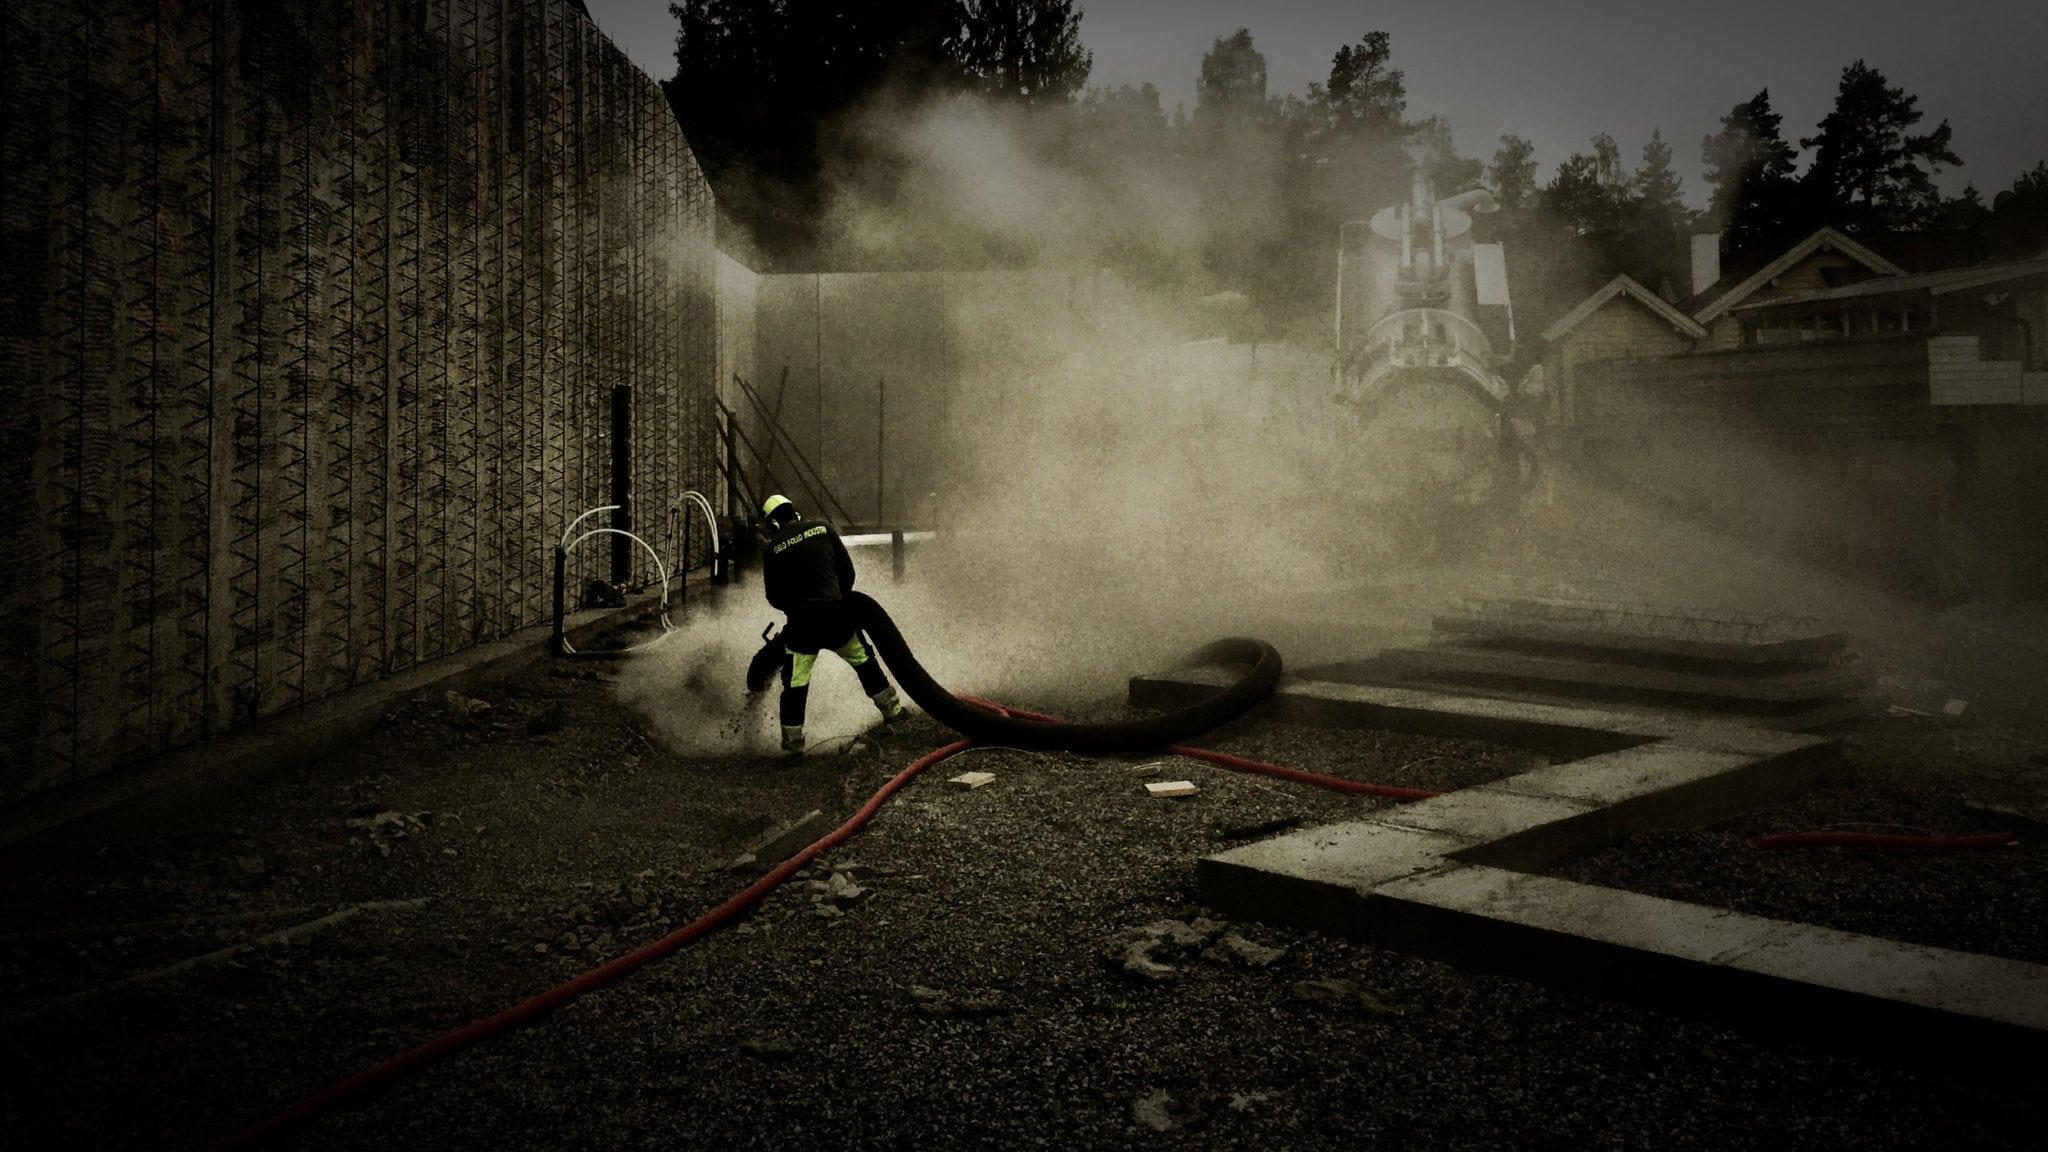 oslo-follo-industri-slamsuging-tett-kloakk-oslo-avlop-høytrykksspyling